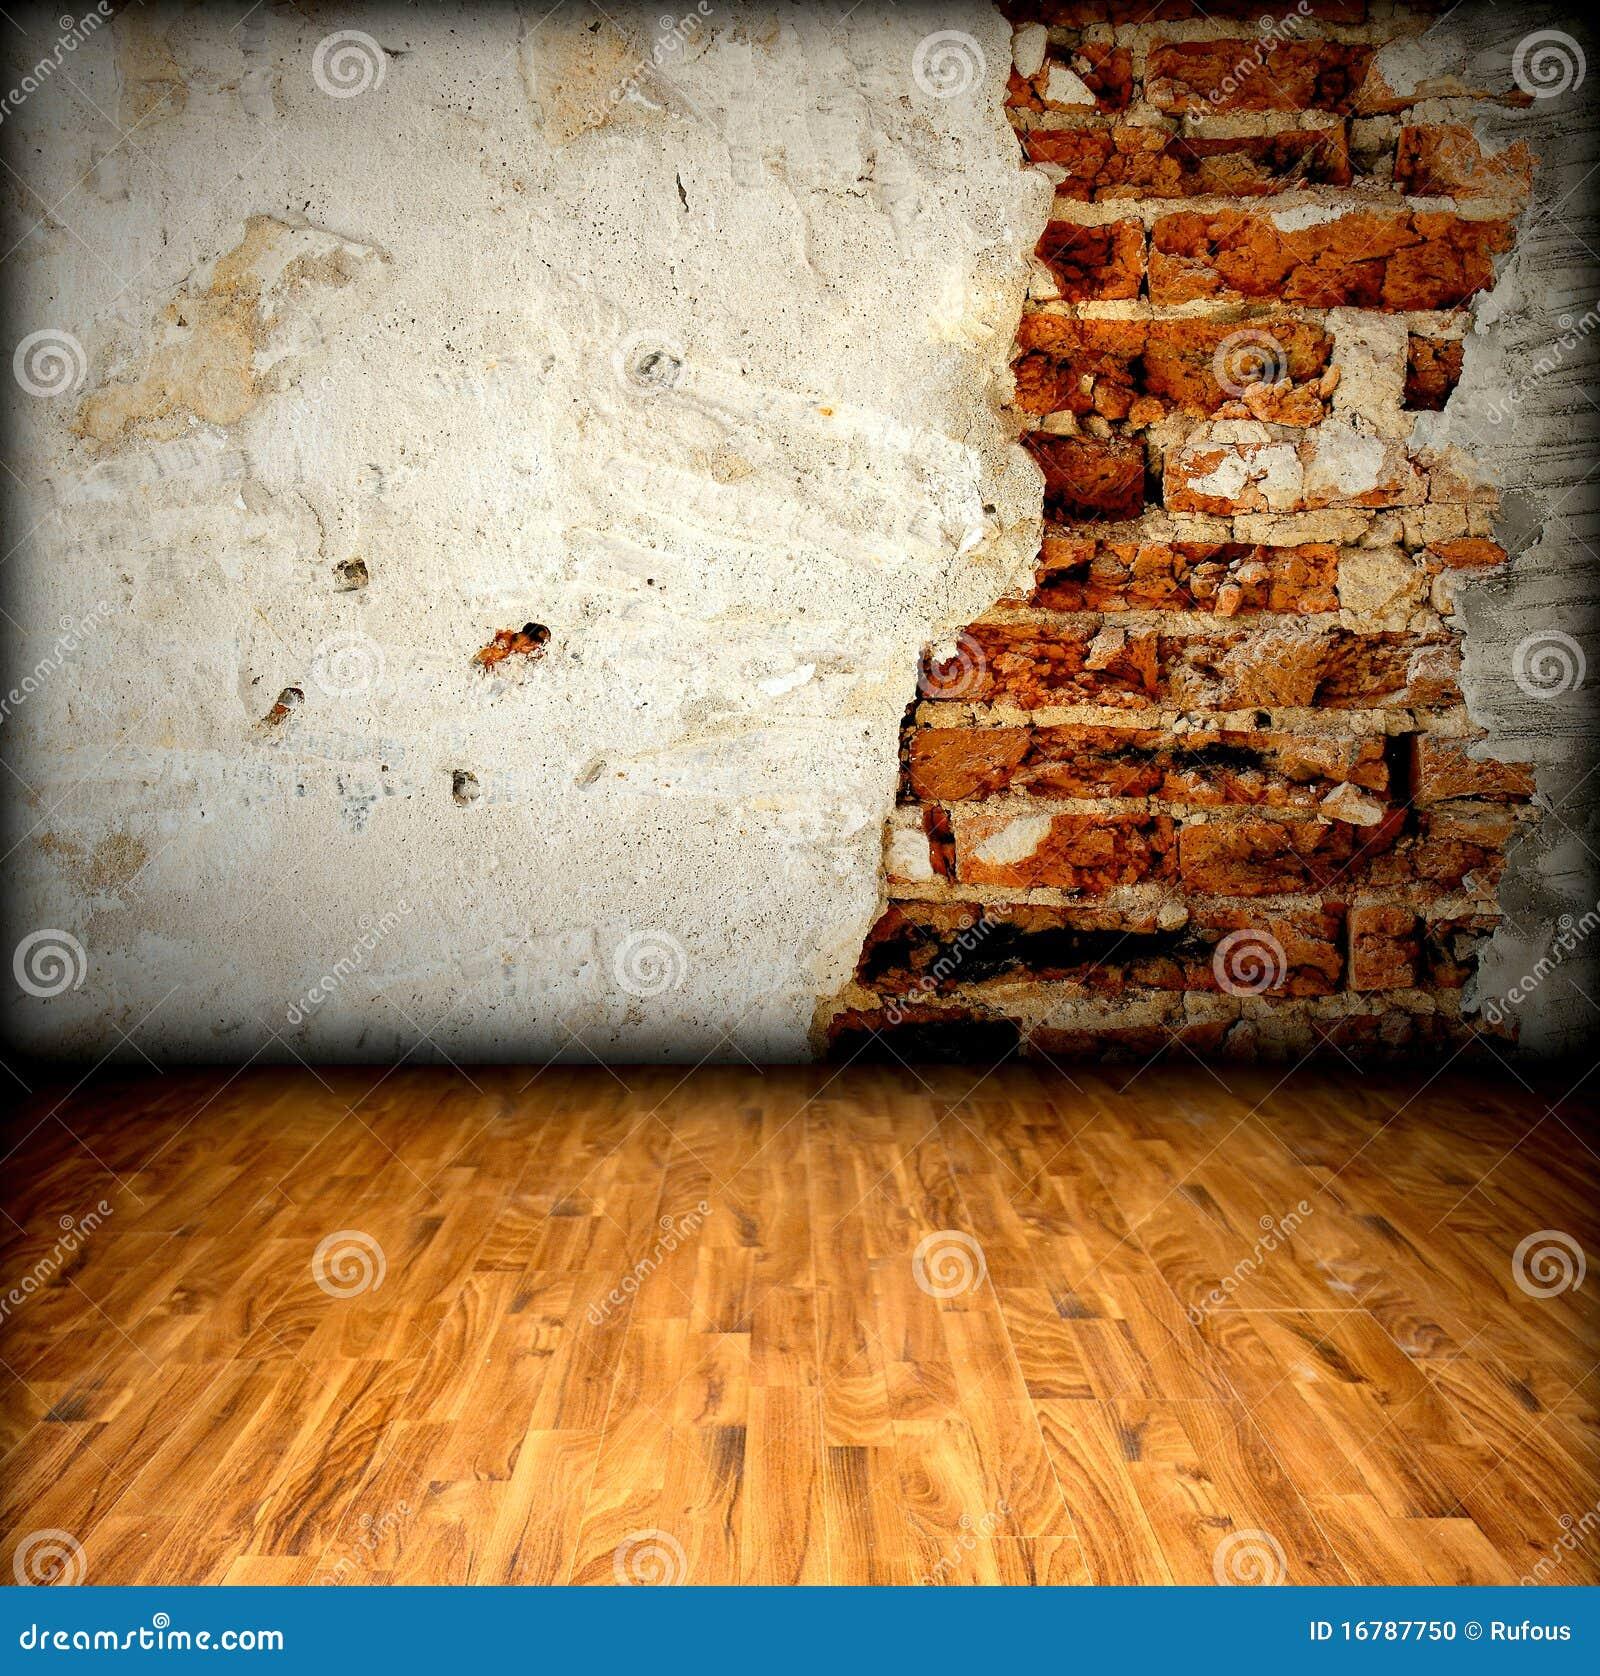 Z Brick Flooring : Brick wall and wood floor stock photo image